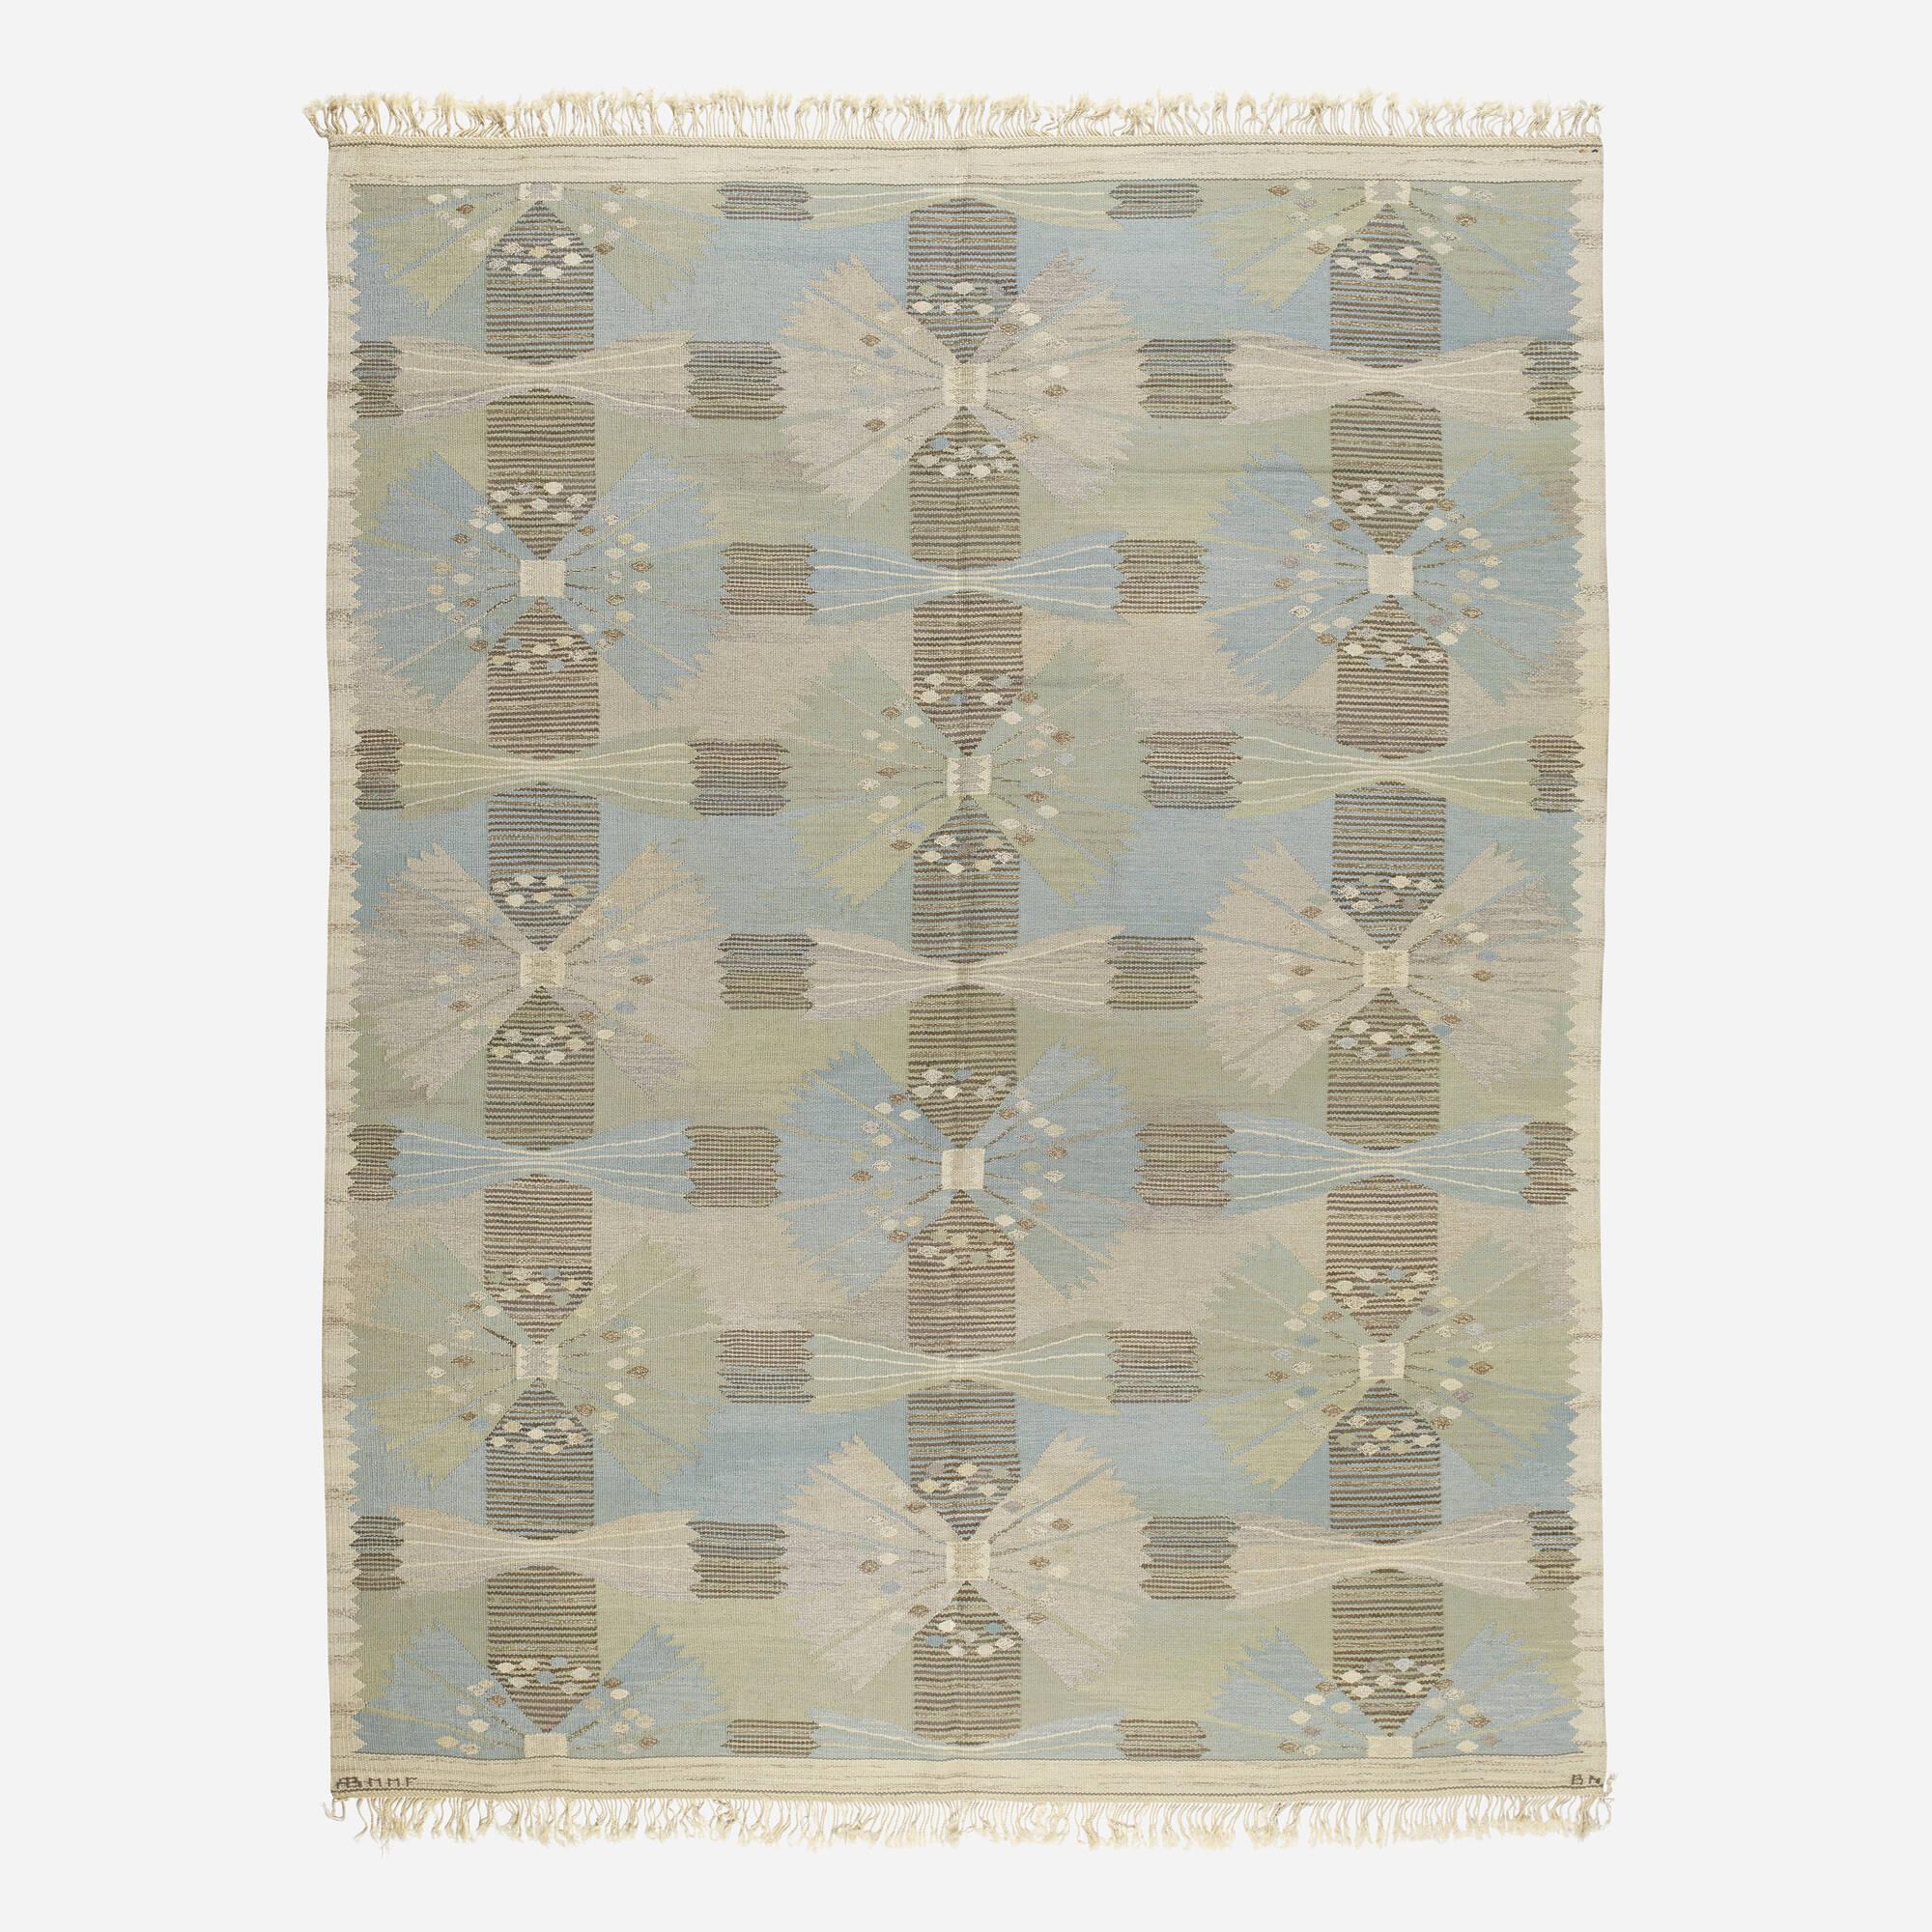 110: Barbro Nilsson / The Park, Falkman tapestry weave carpet (1 of 2)